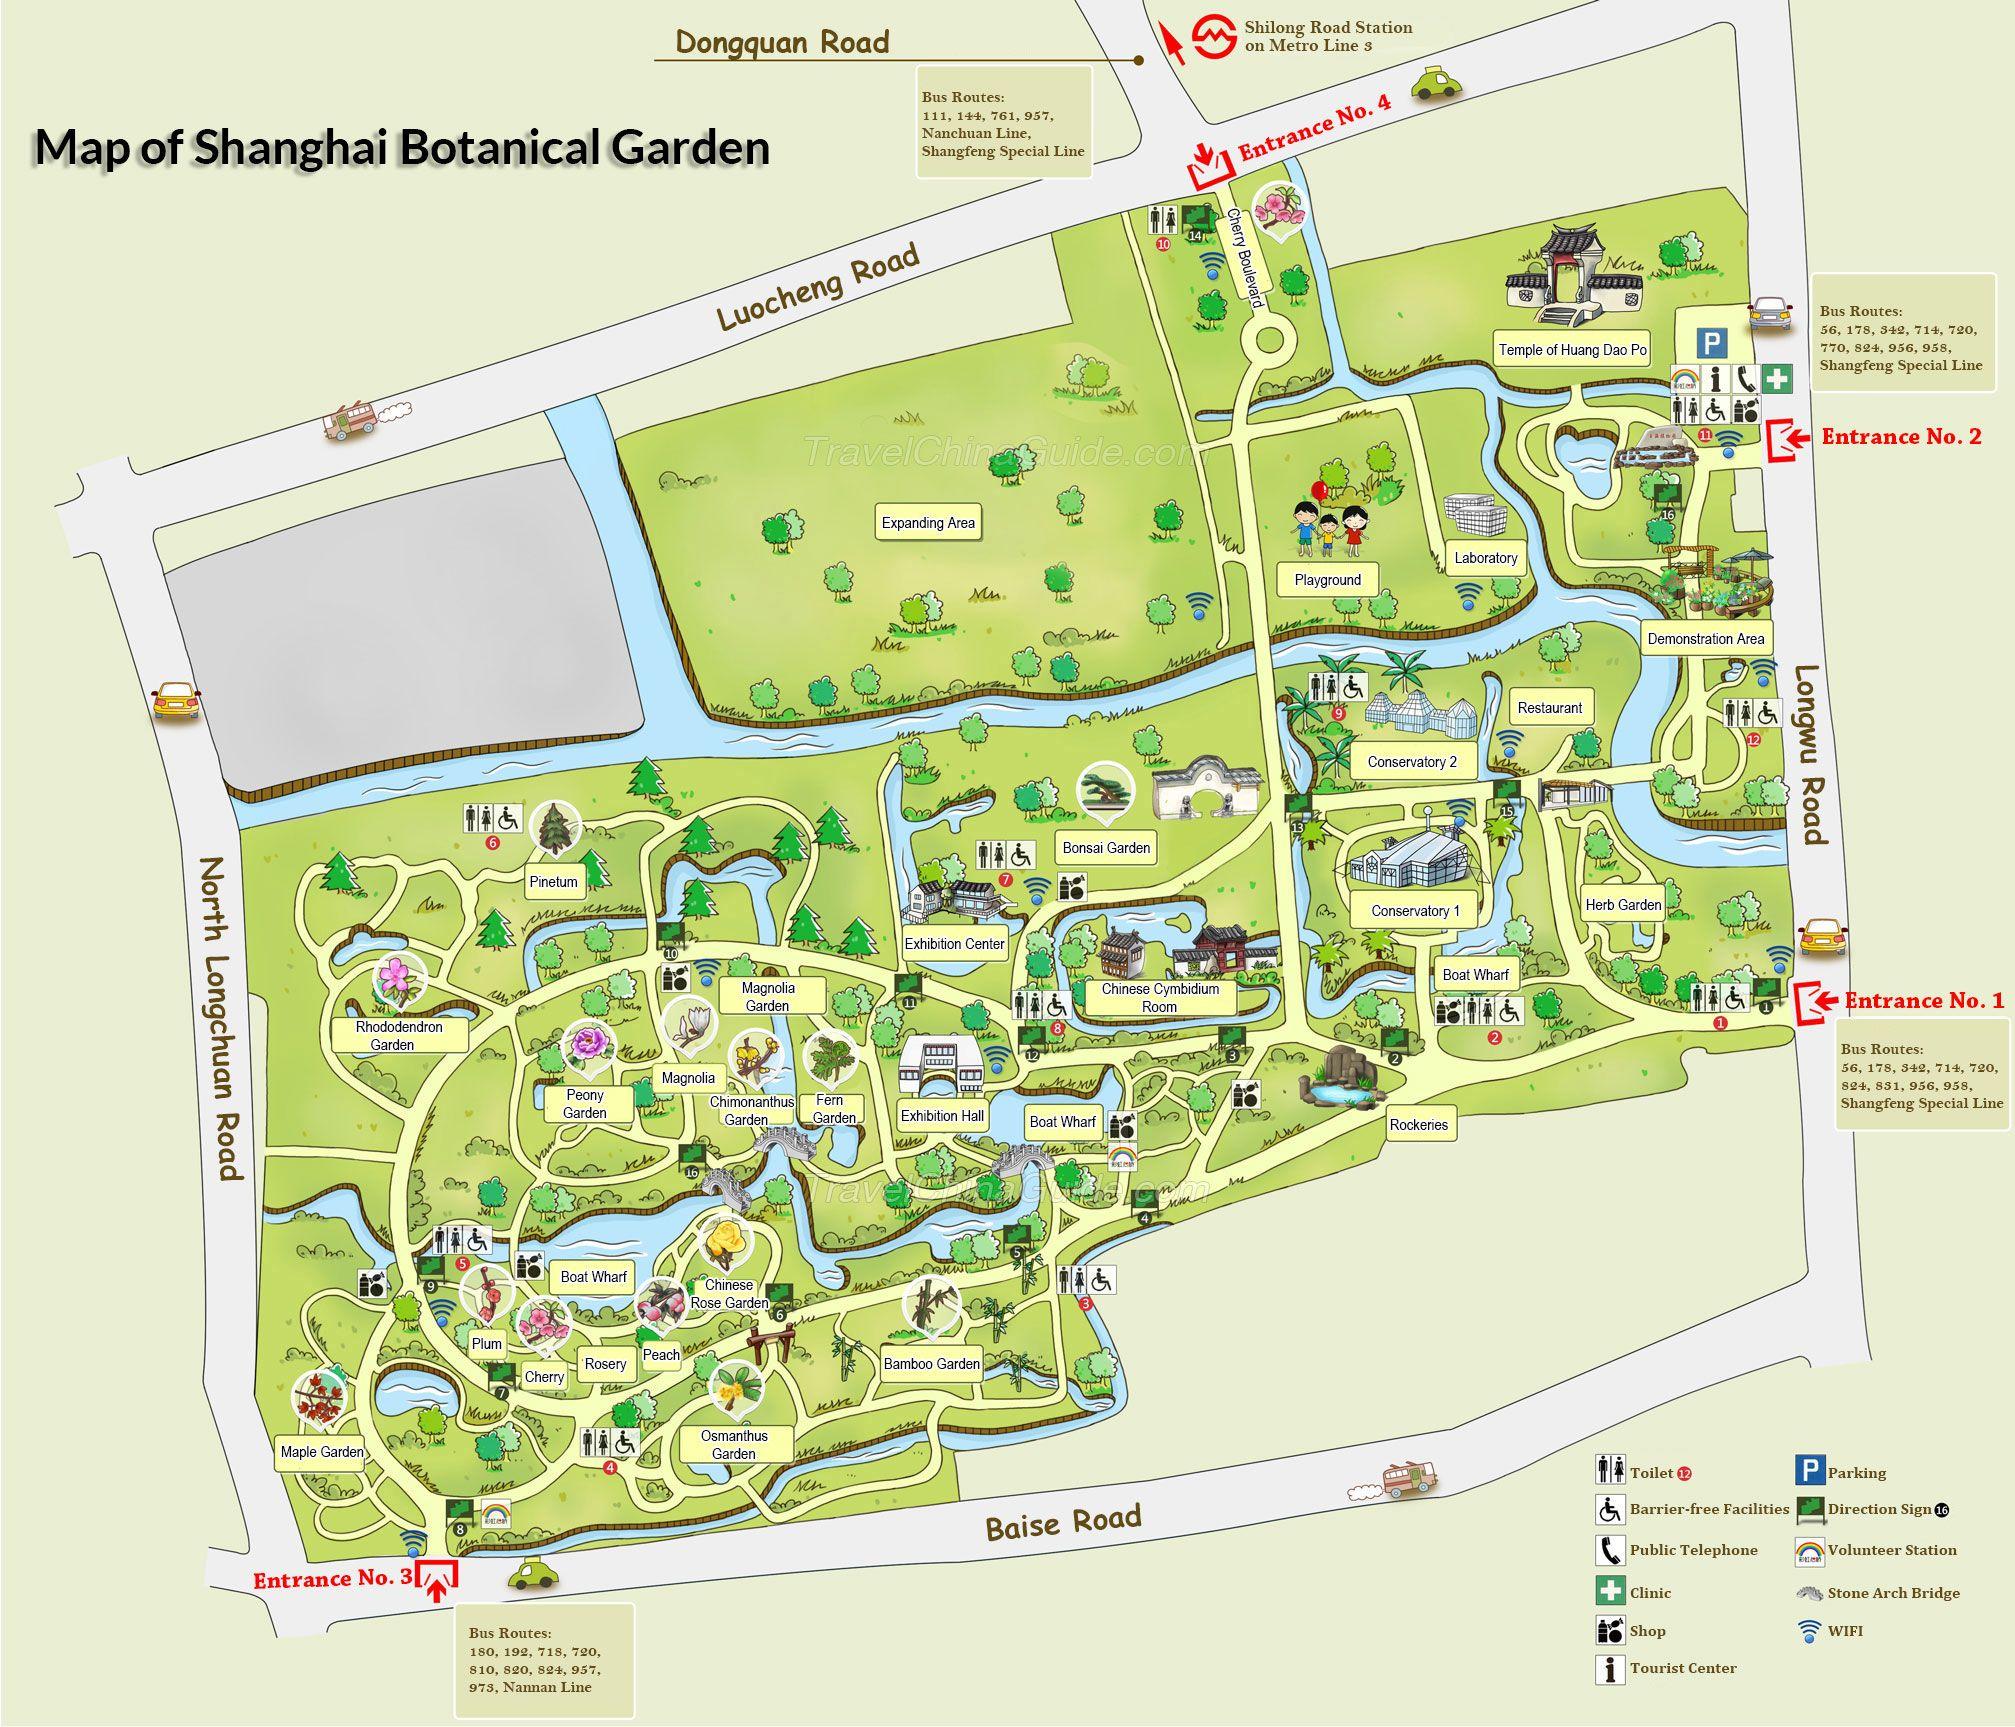 Shanghai Botanical Garden Map Botanical Gardens Atlanta Botanical Garden National Botanical Gardens